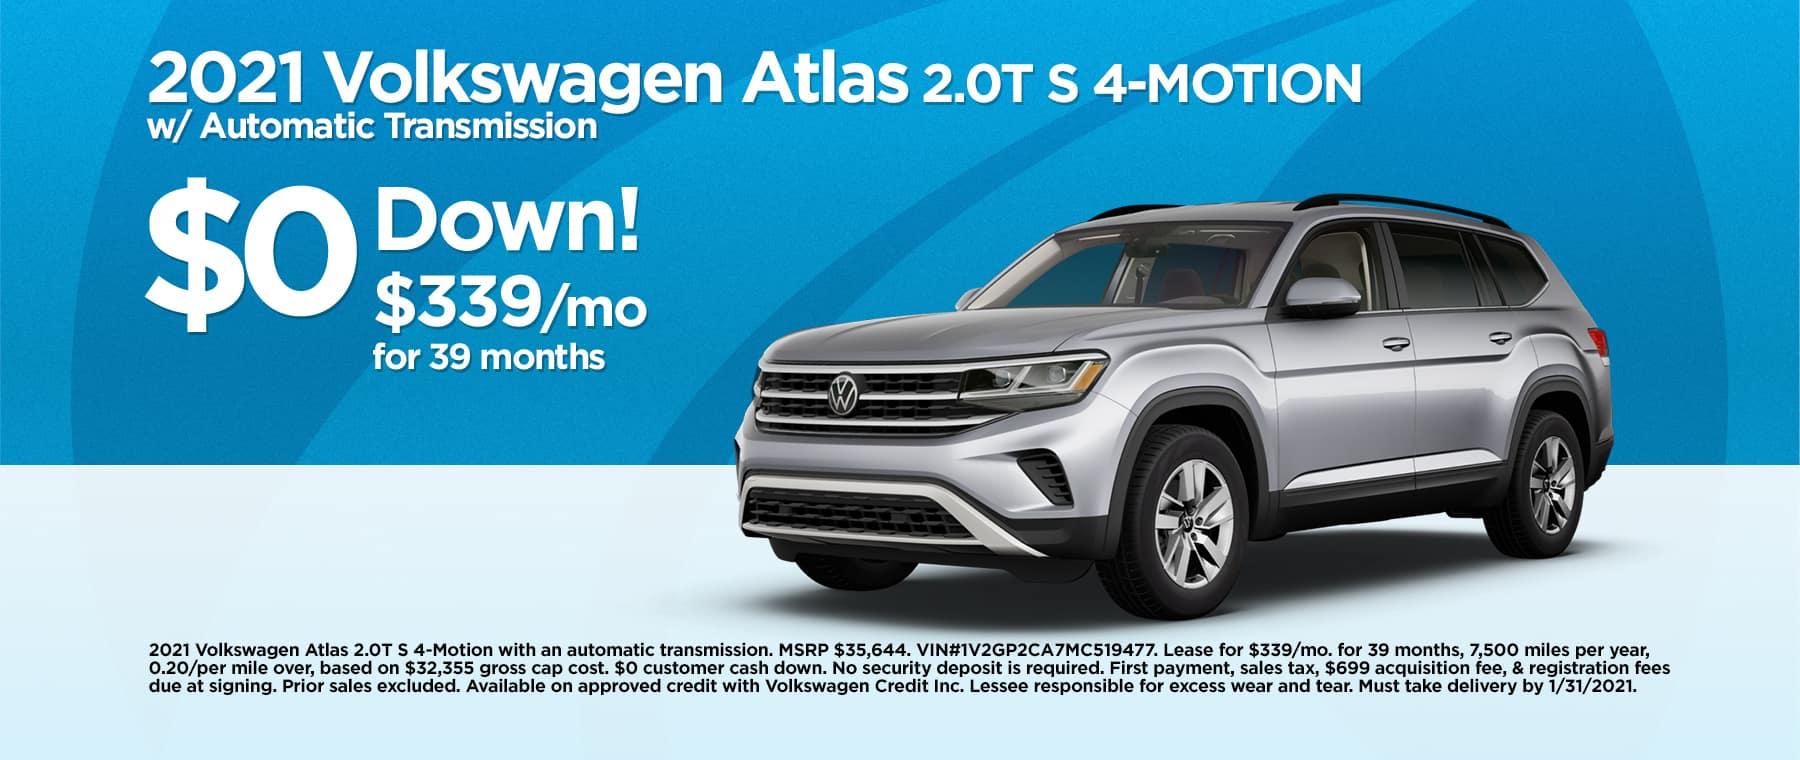 2101 VW Atlas